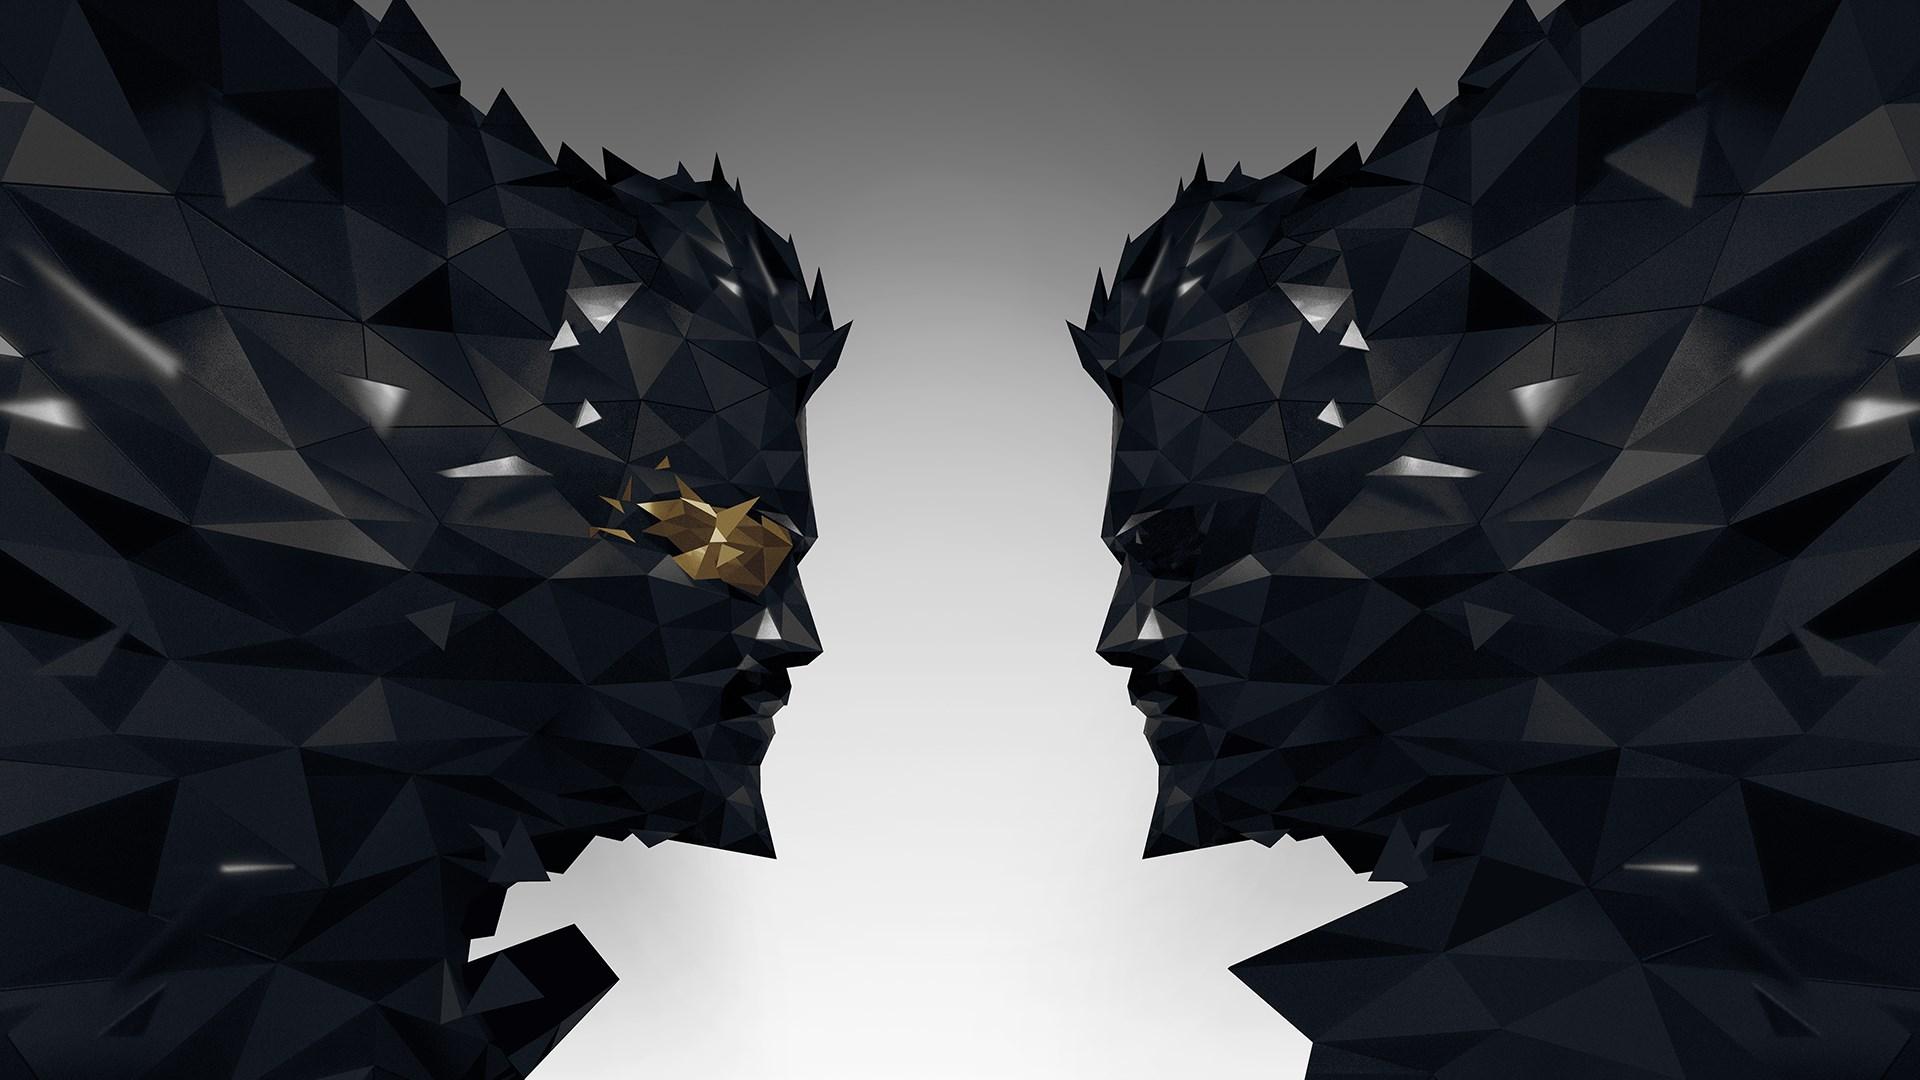 Deus Ex: Mankind Divided - Edição Digital Deluxe